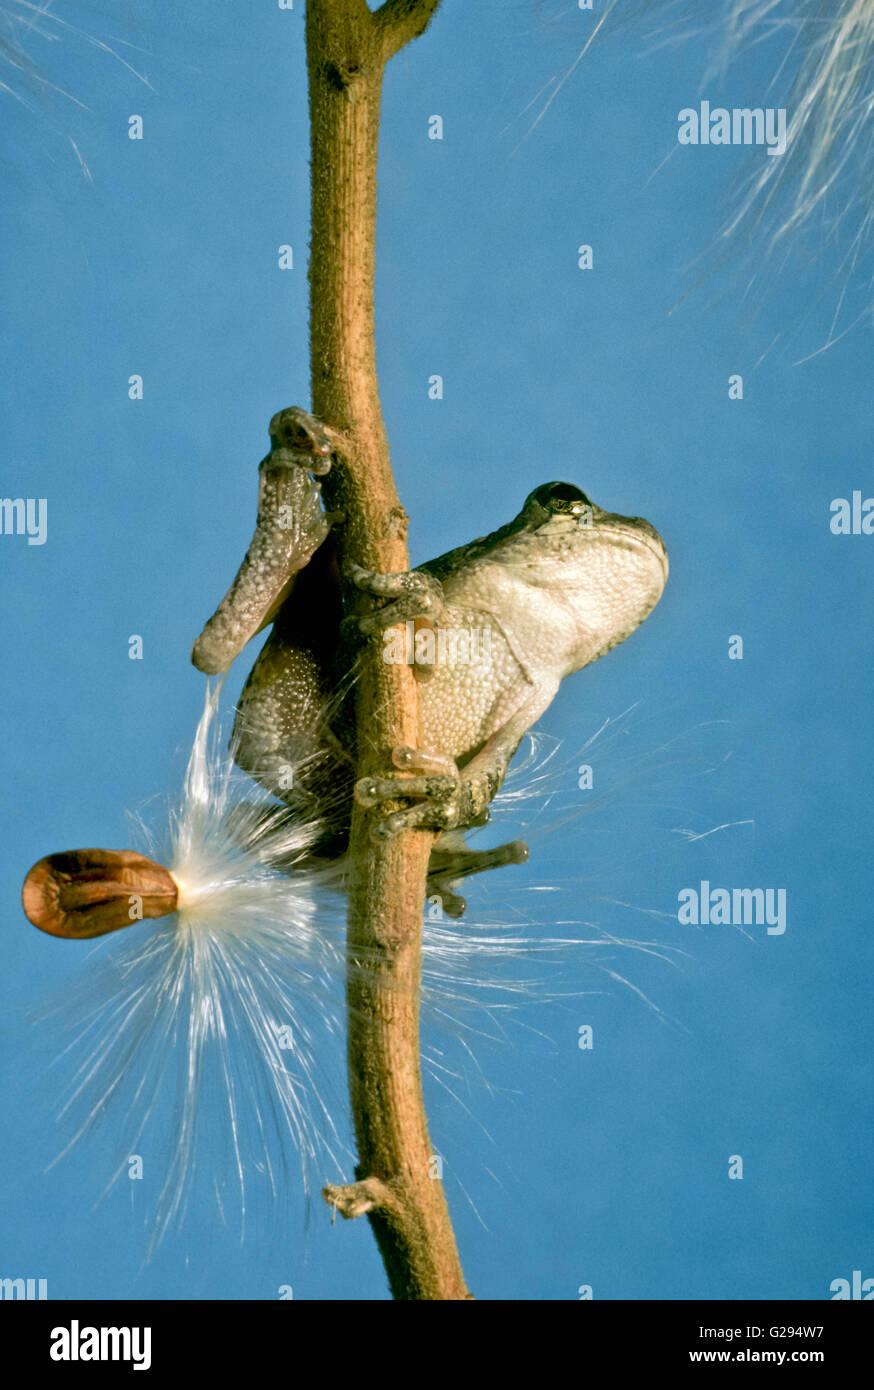 The bottom side of a tree frog, Hyla versicolor, sitting on Milkweed seeds - Stock Image